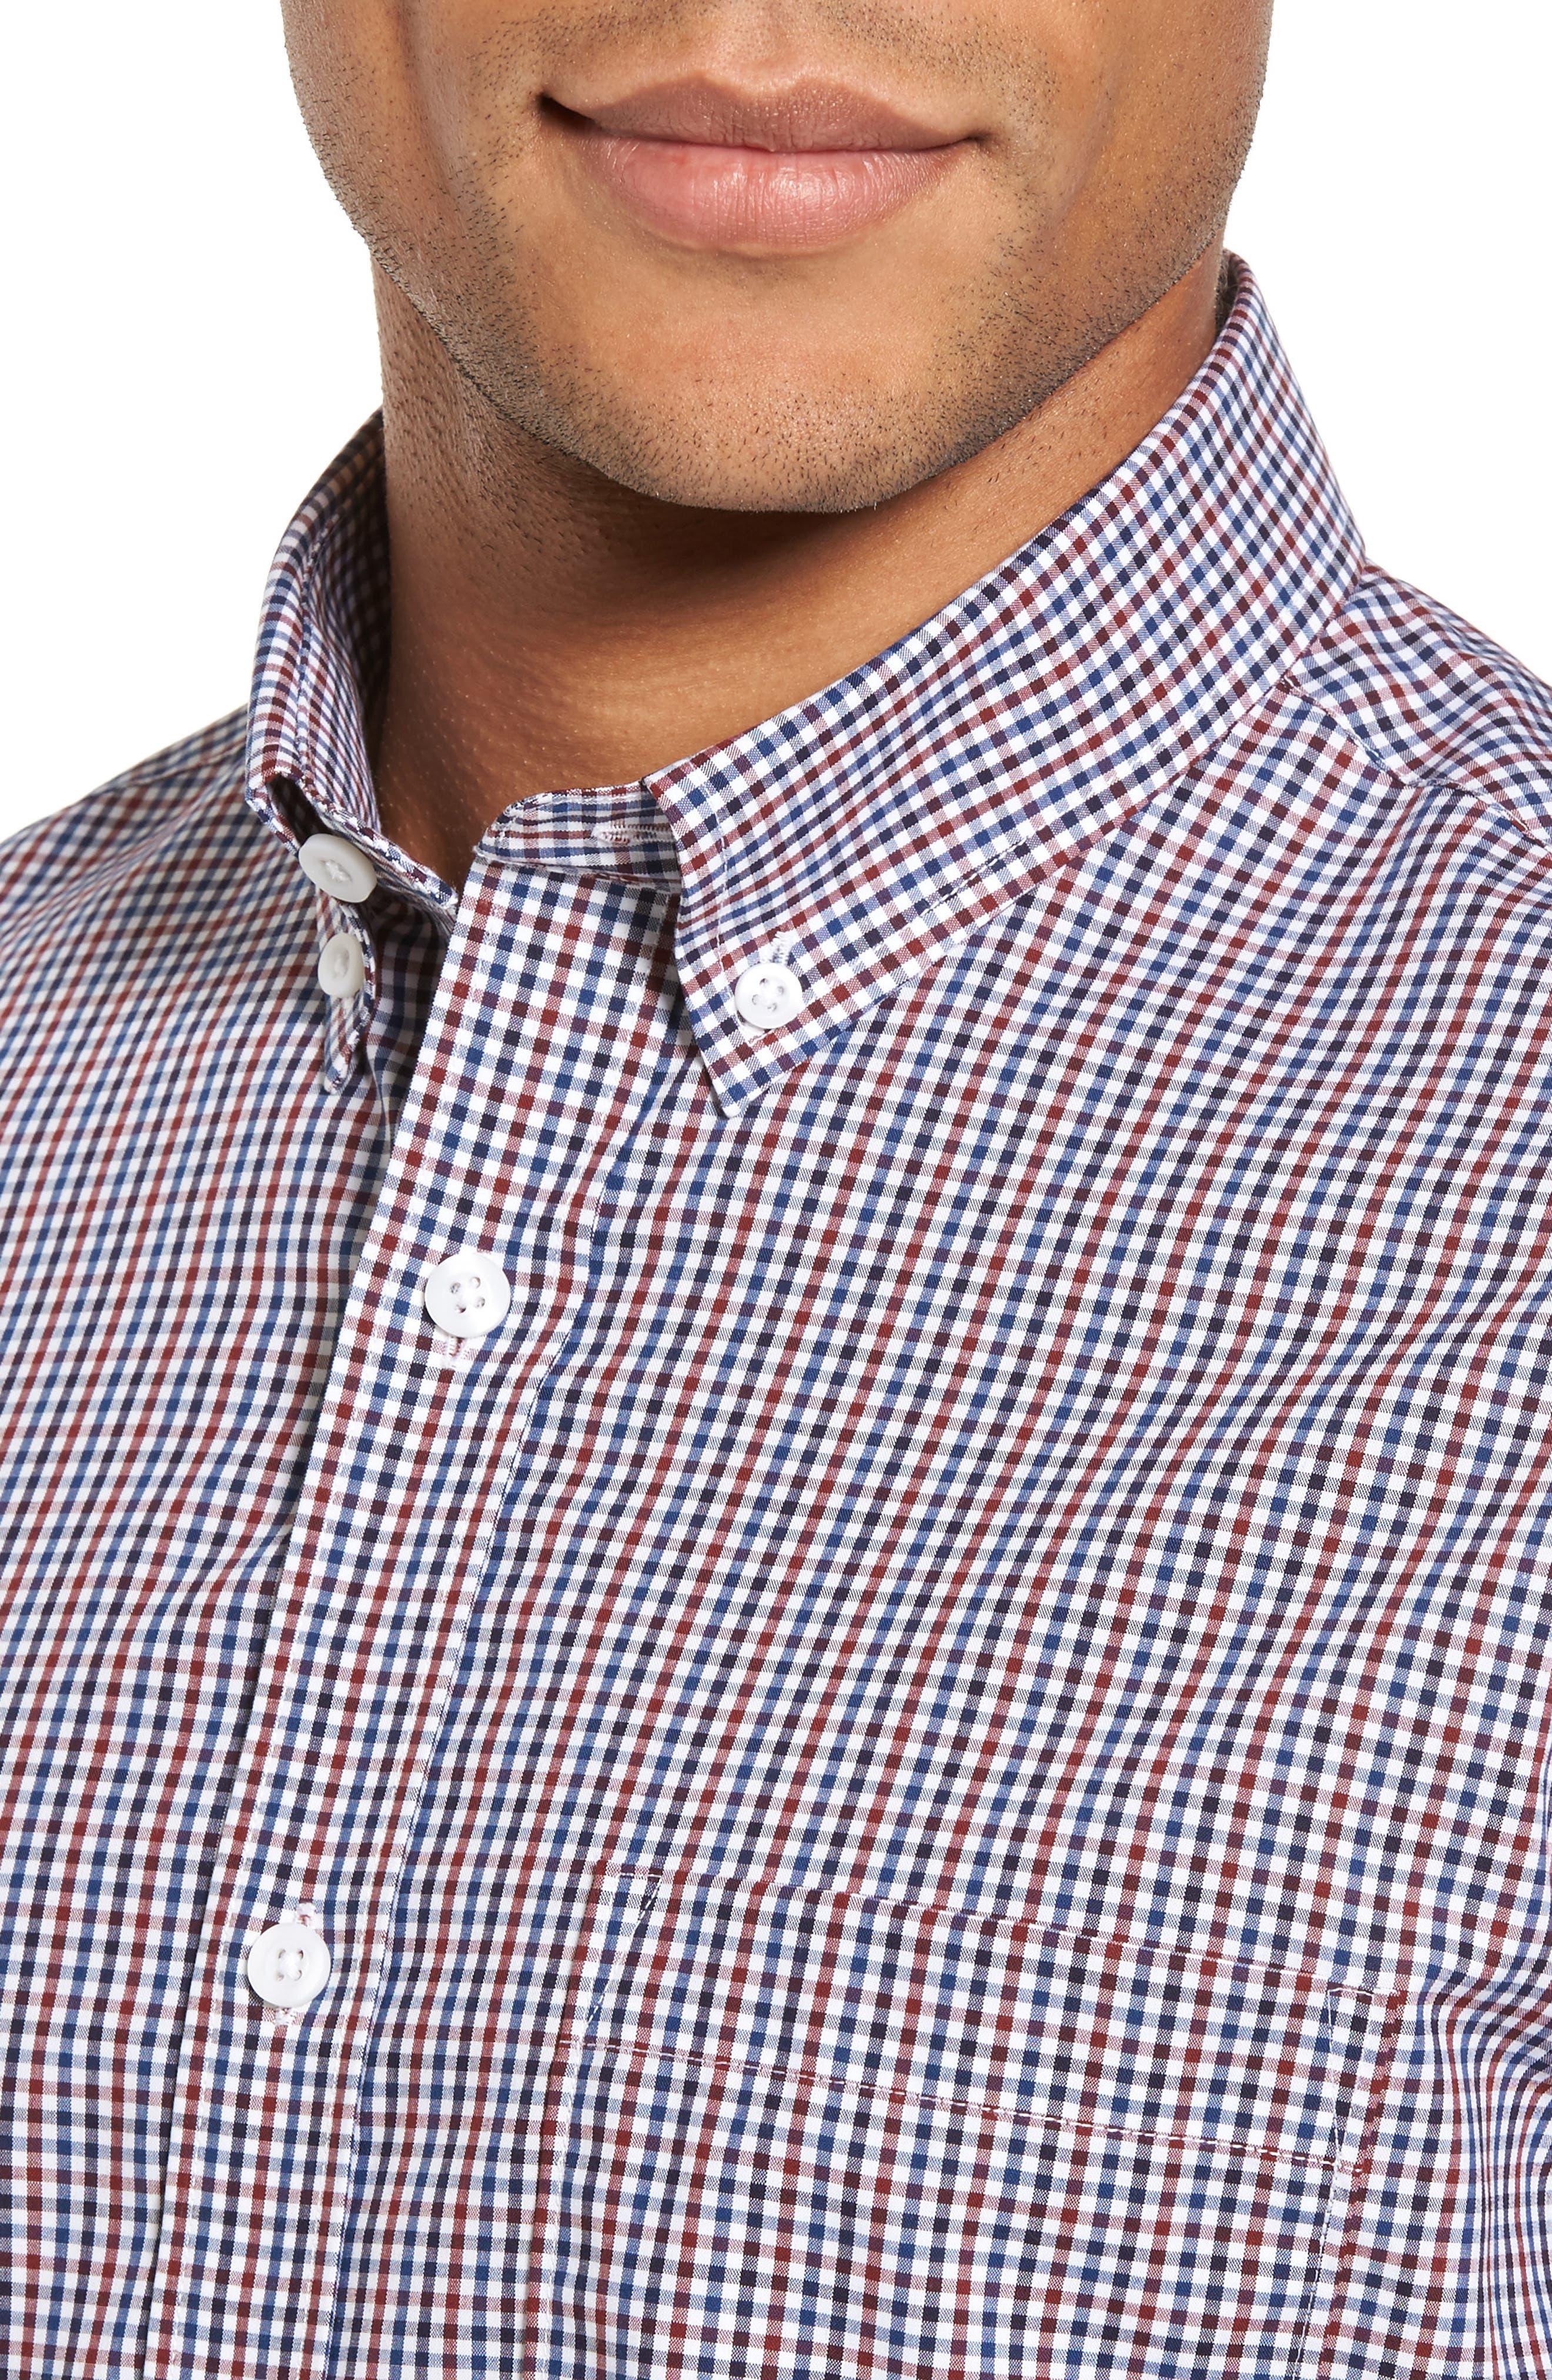 Spade Trim Fit Non-Iron Mini Check Sport Shirt,                             Alternate thumbnail 4, color,                             White Red Mini Check